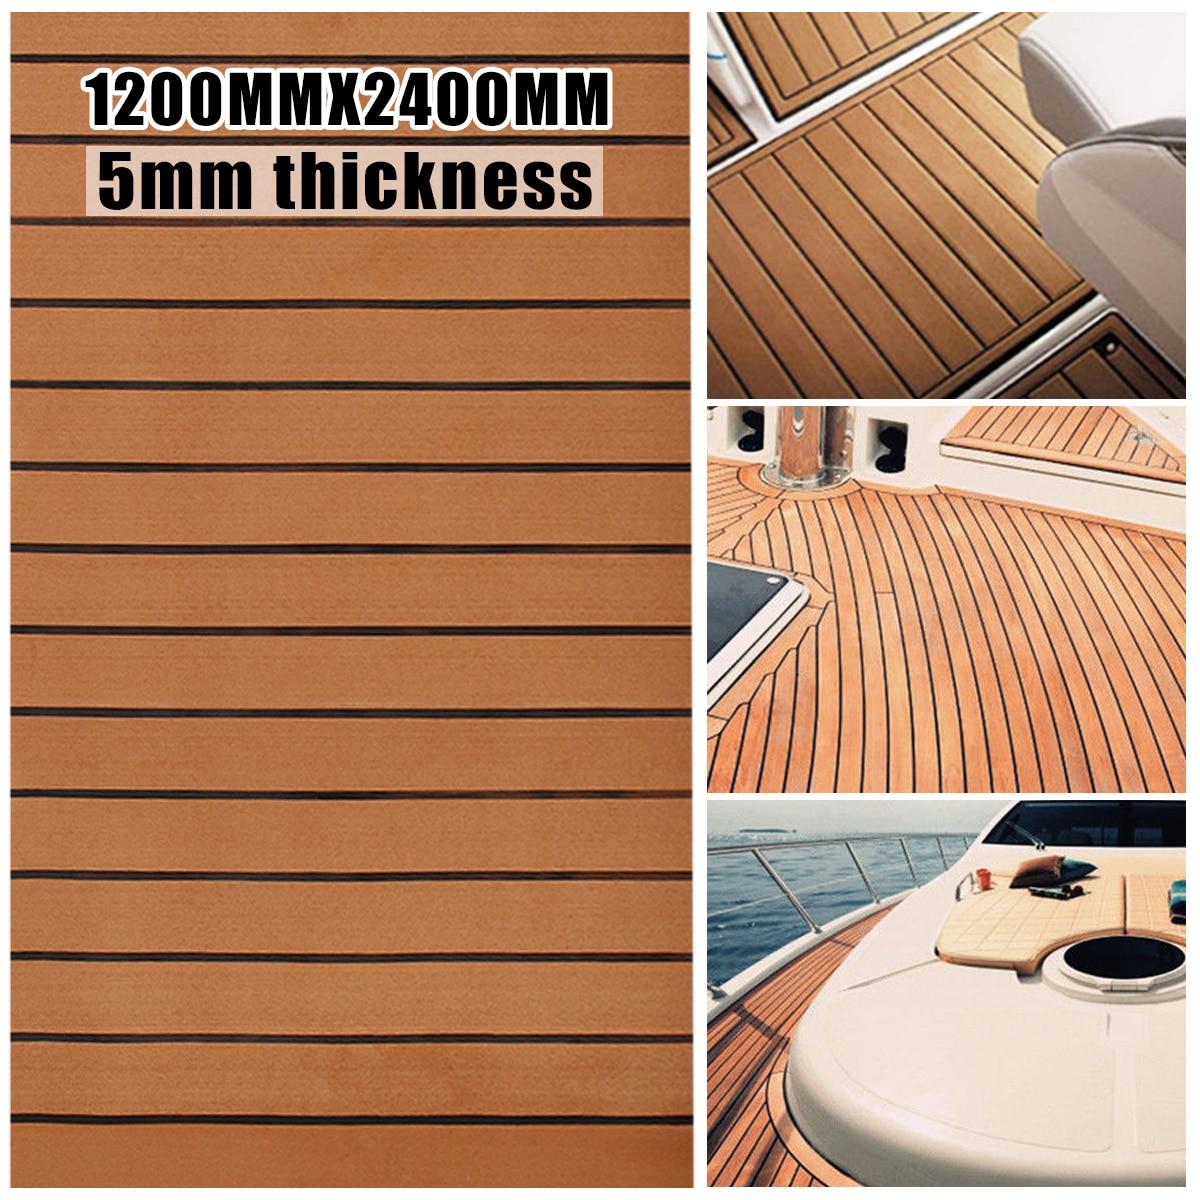 120cmx240cmx5mm Self Adhesive EVA Foam Faux Teak Sheet Boat Yacht Synthetic Teak Decking Brown And Black Wholesale